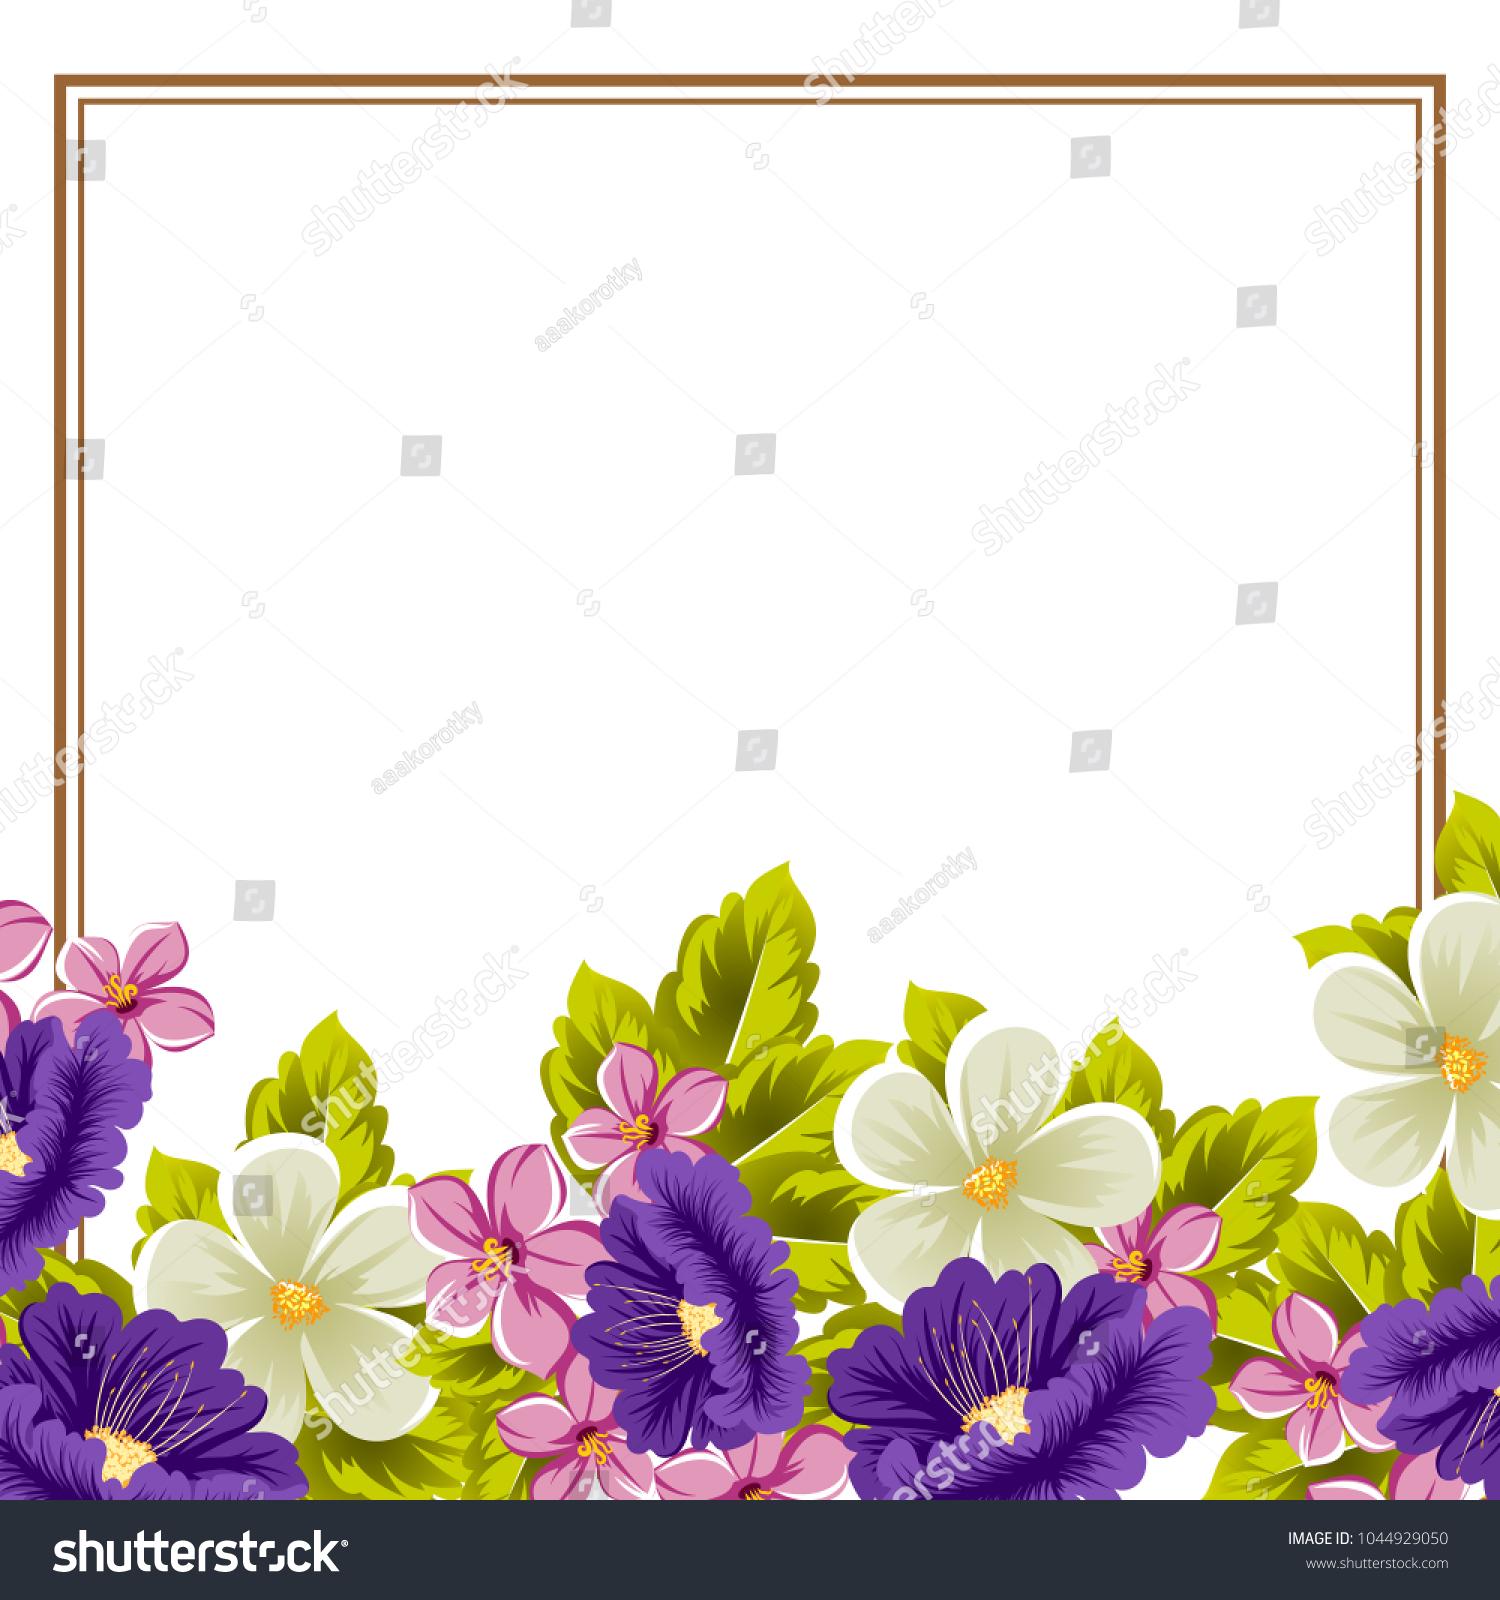 Frame flowers your design postcards greeting stock vector 1044929050 frame of flowers for your design of postcards greeting cards invitations for birthday izmirmasajfo